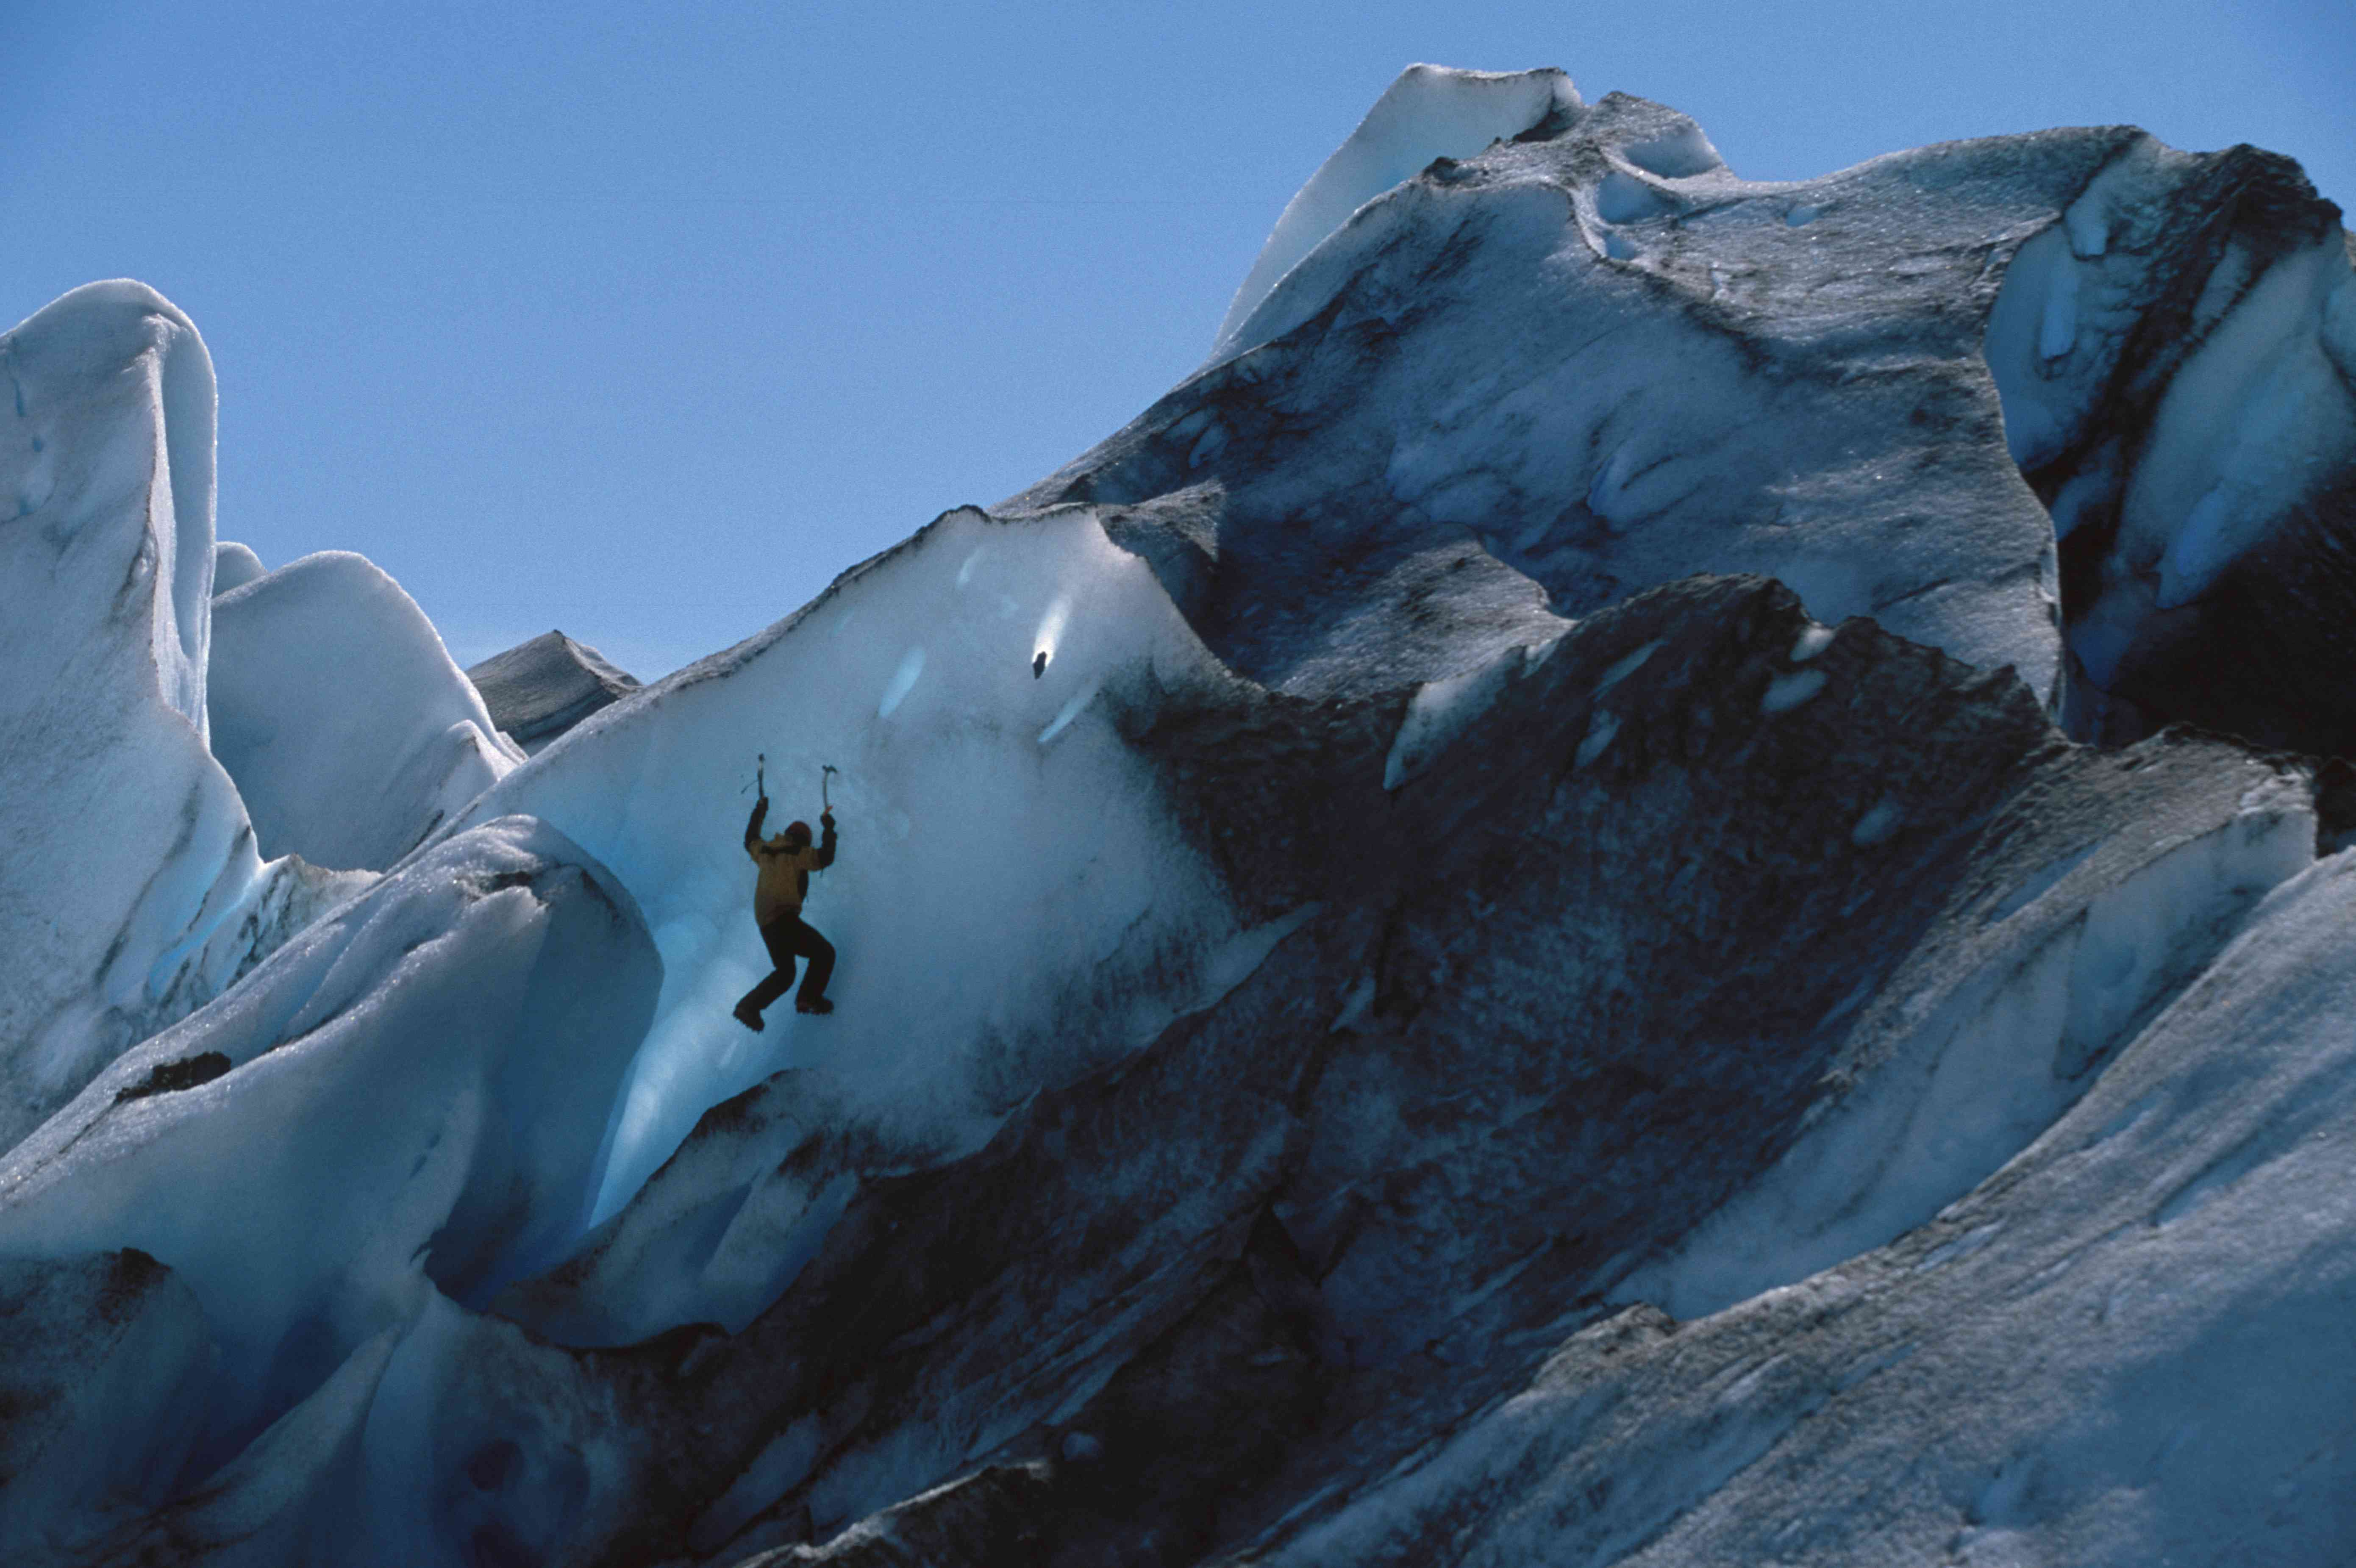 Ice climber on the bright-blue Viedma Glacier